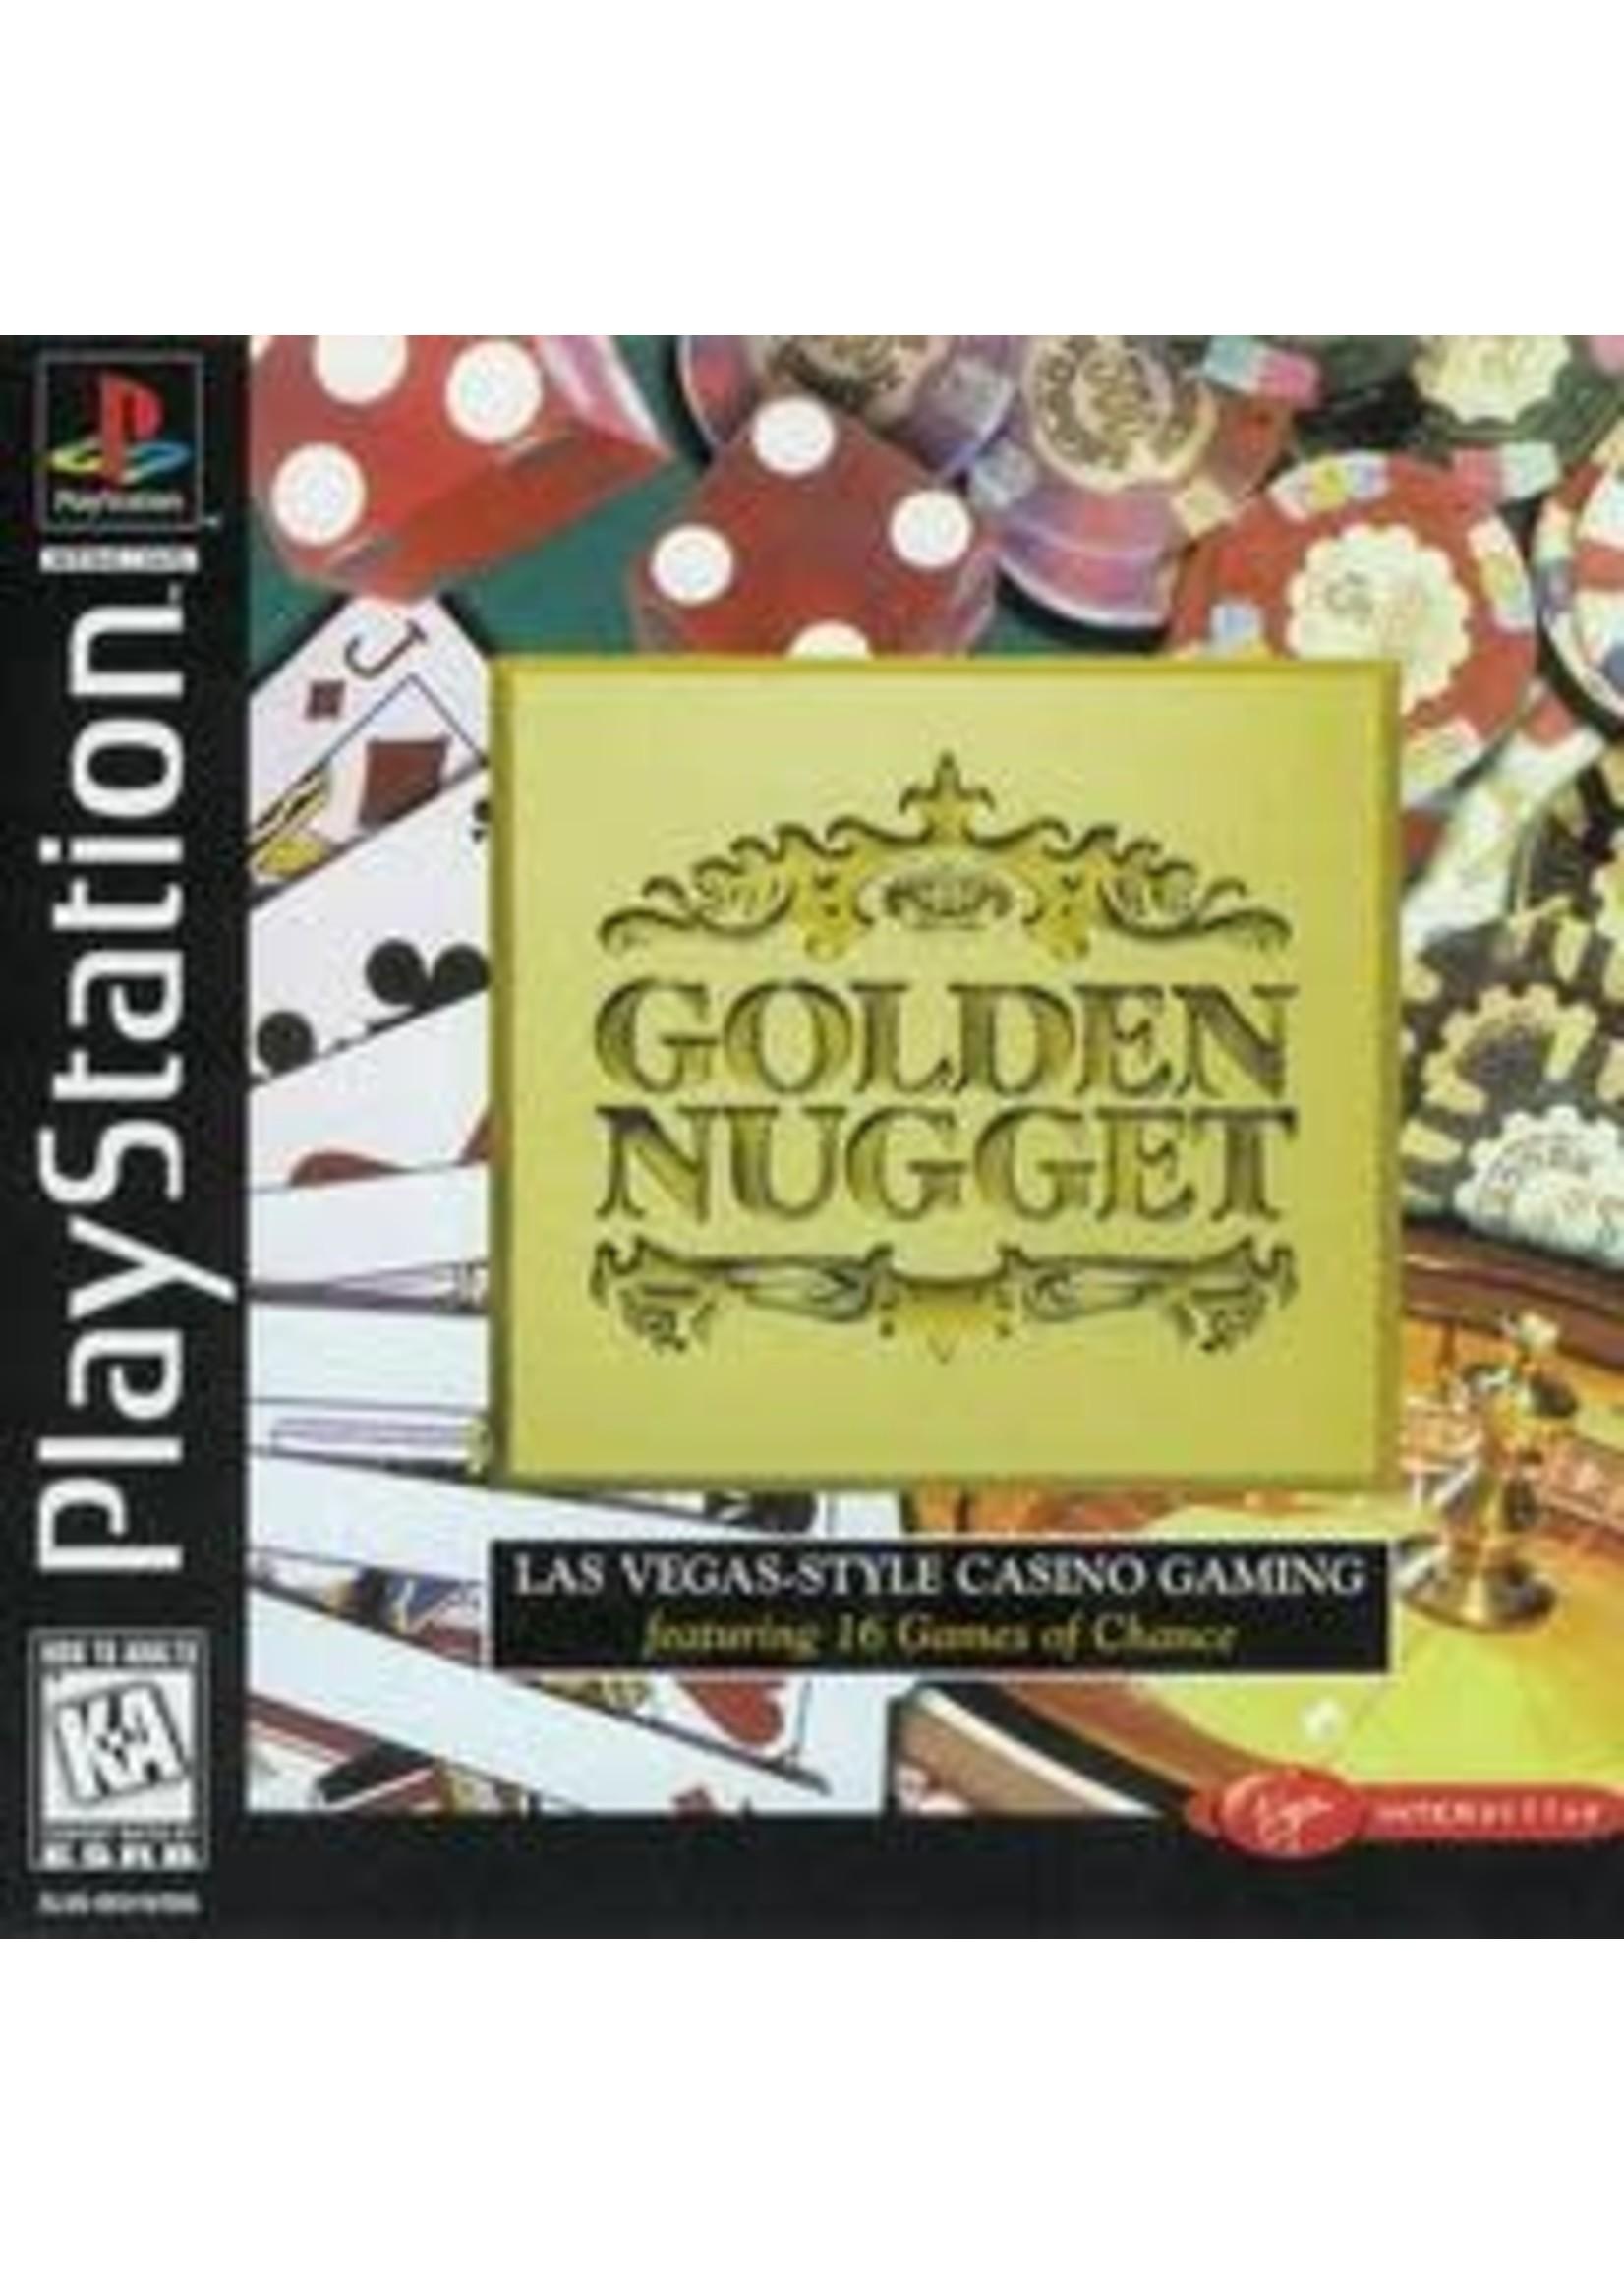 Golden Nugget Playstation